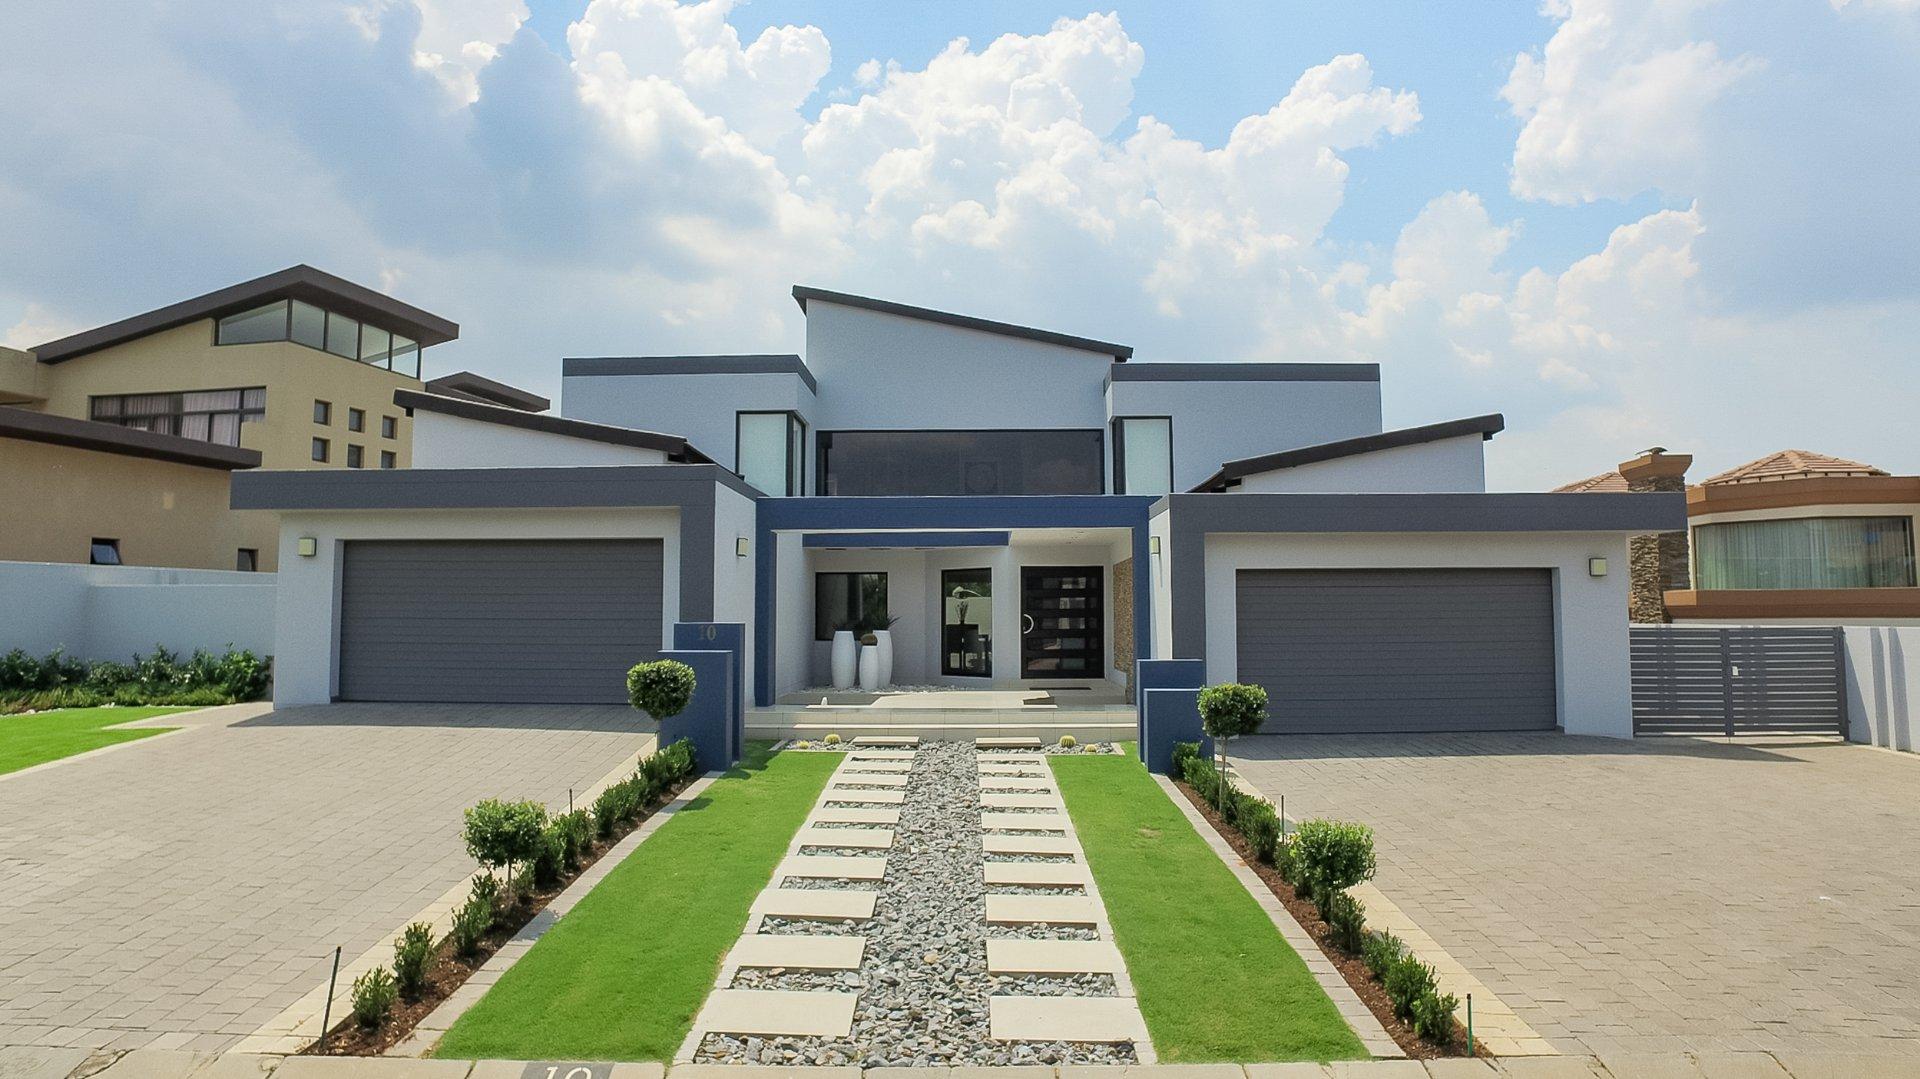 , House, 6 Bedrooms - ZAR 8,795,000